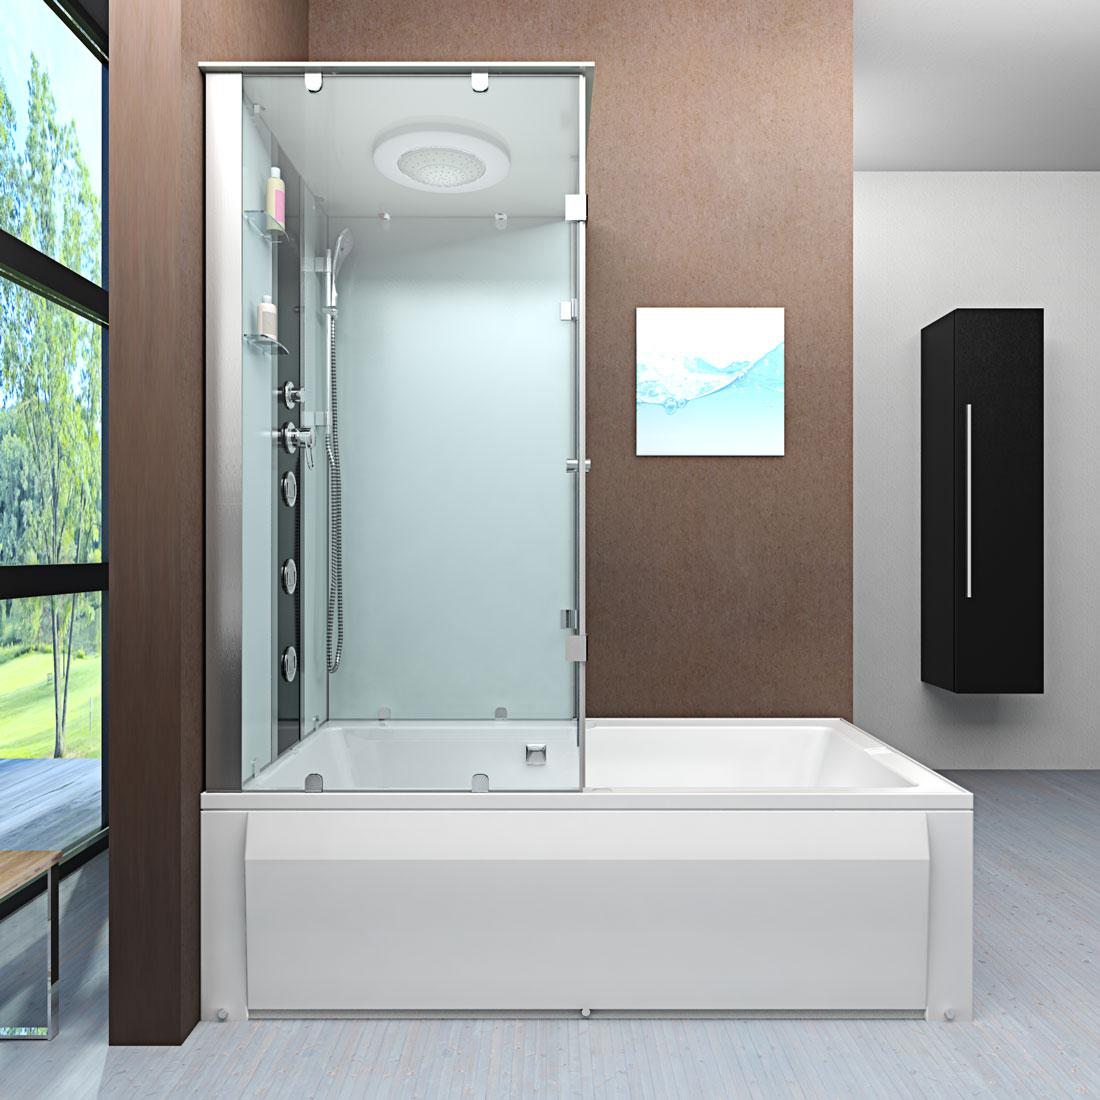 acquavapore dtp50 a000r wanne duschtempel badewanne dusche duschkabine 90x180 ebay. Black Bedroom Furniture Sets. Home Design Ideas